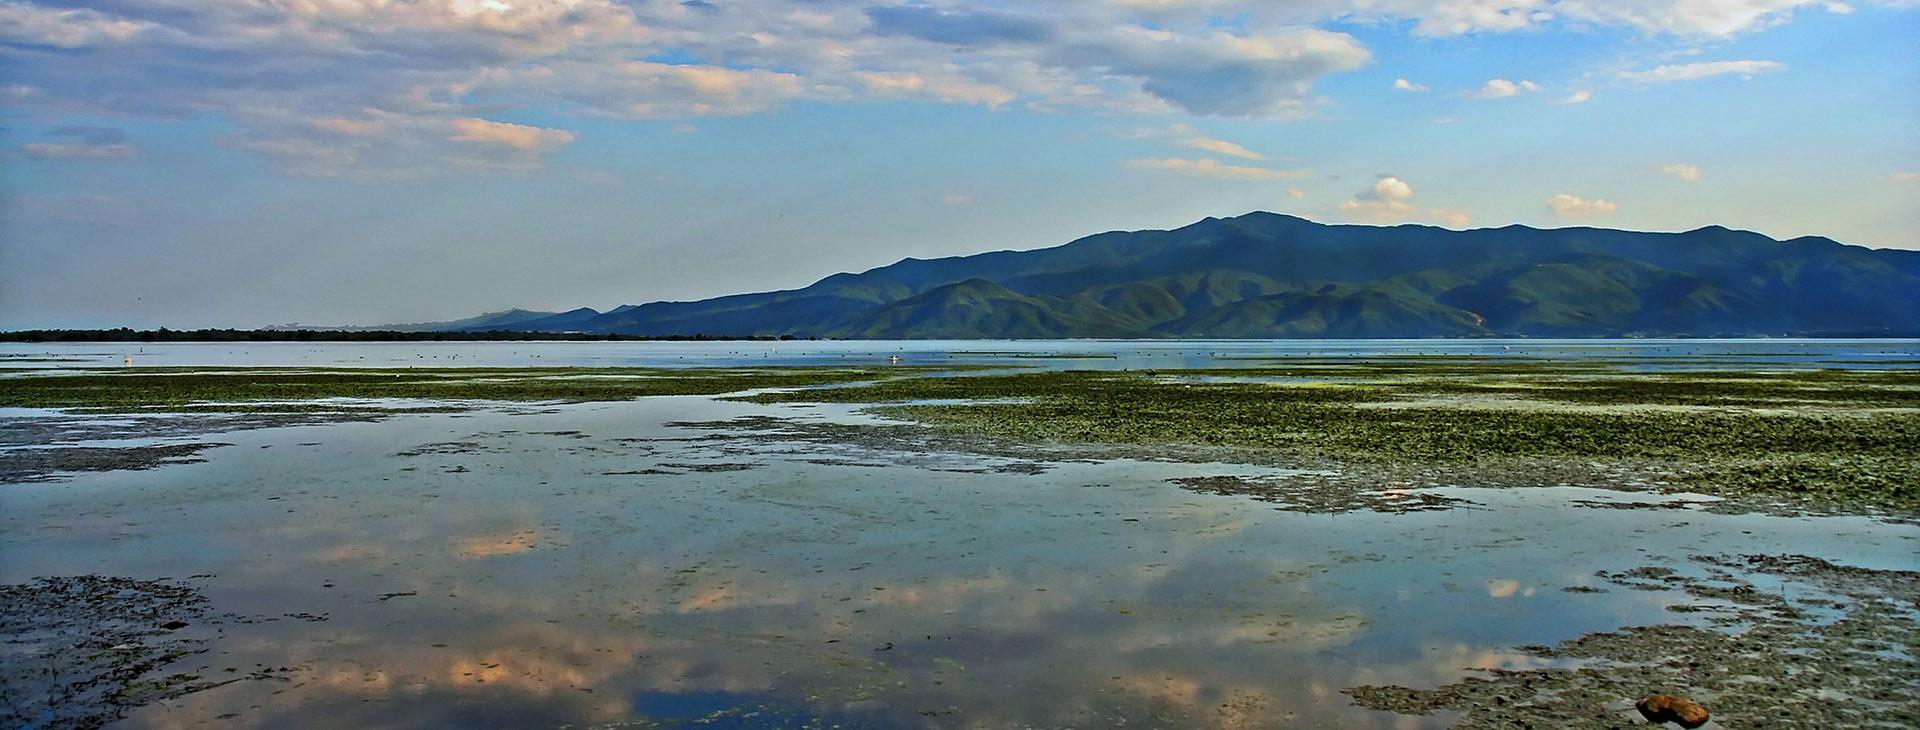 Kerkini lake, Serres